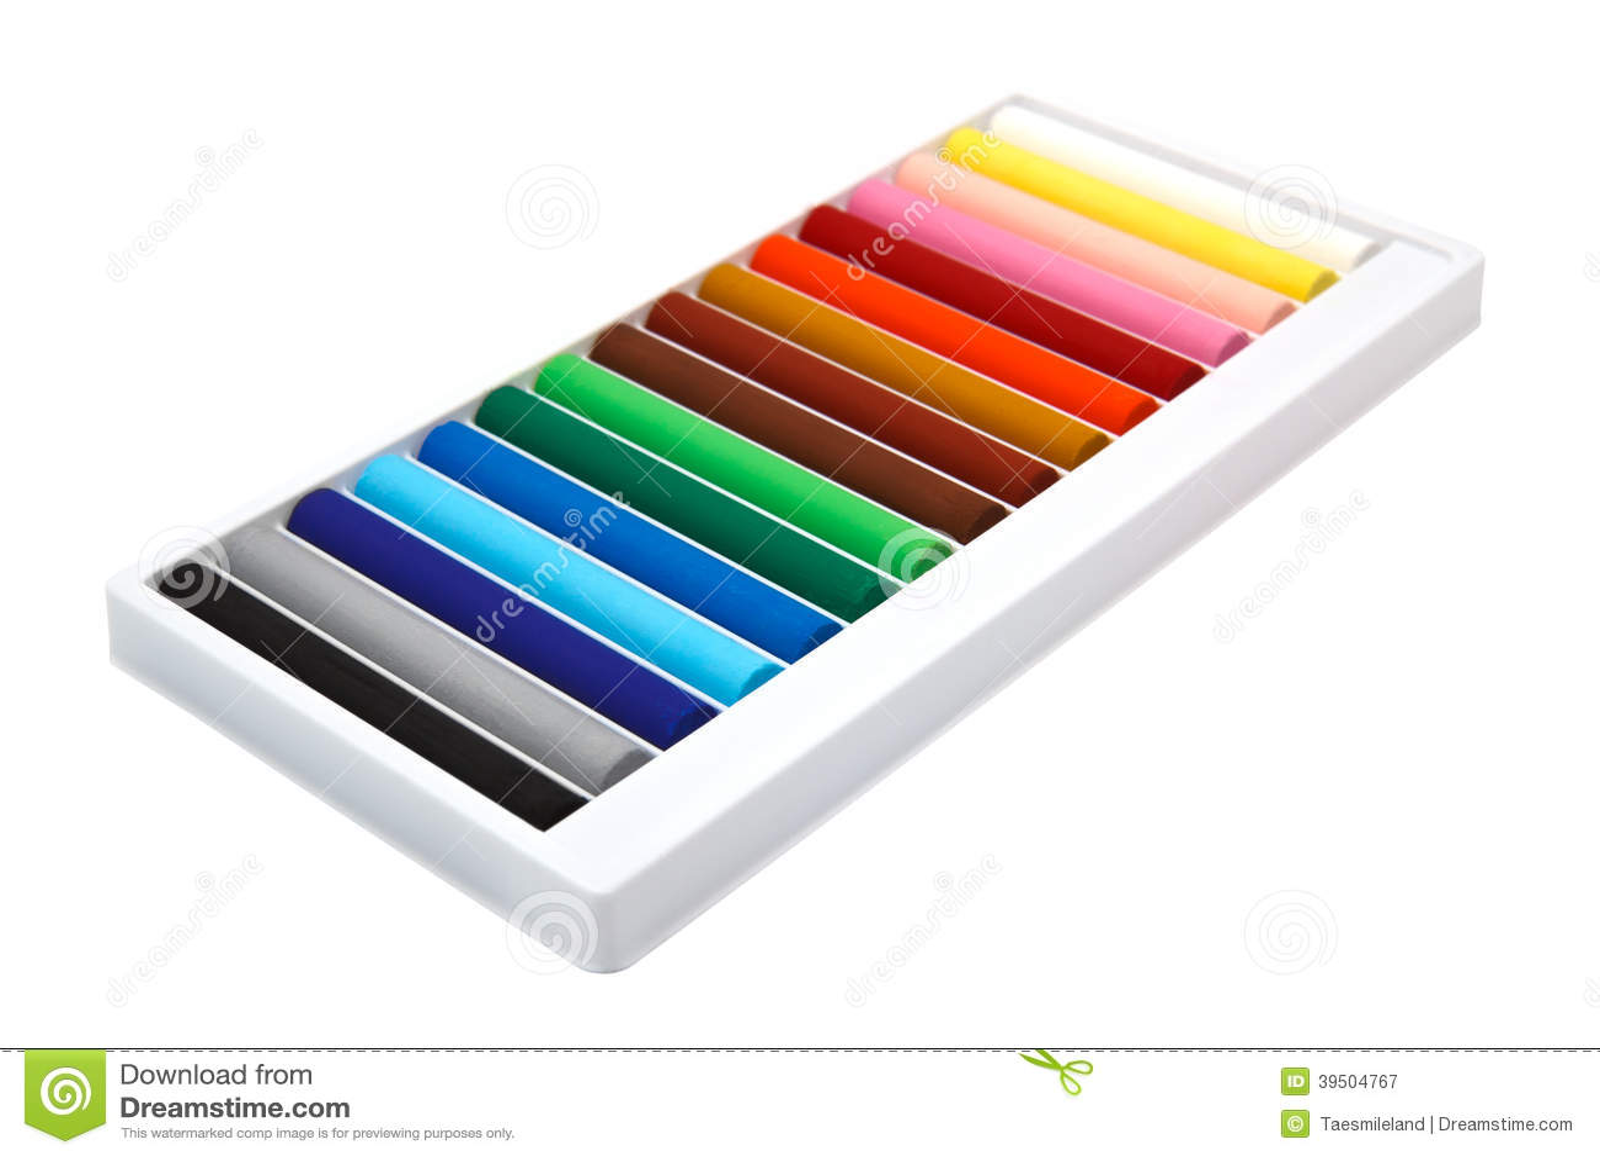 Colorful pastel sticks